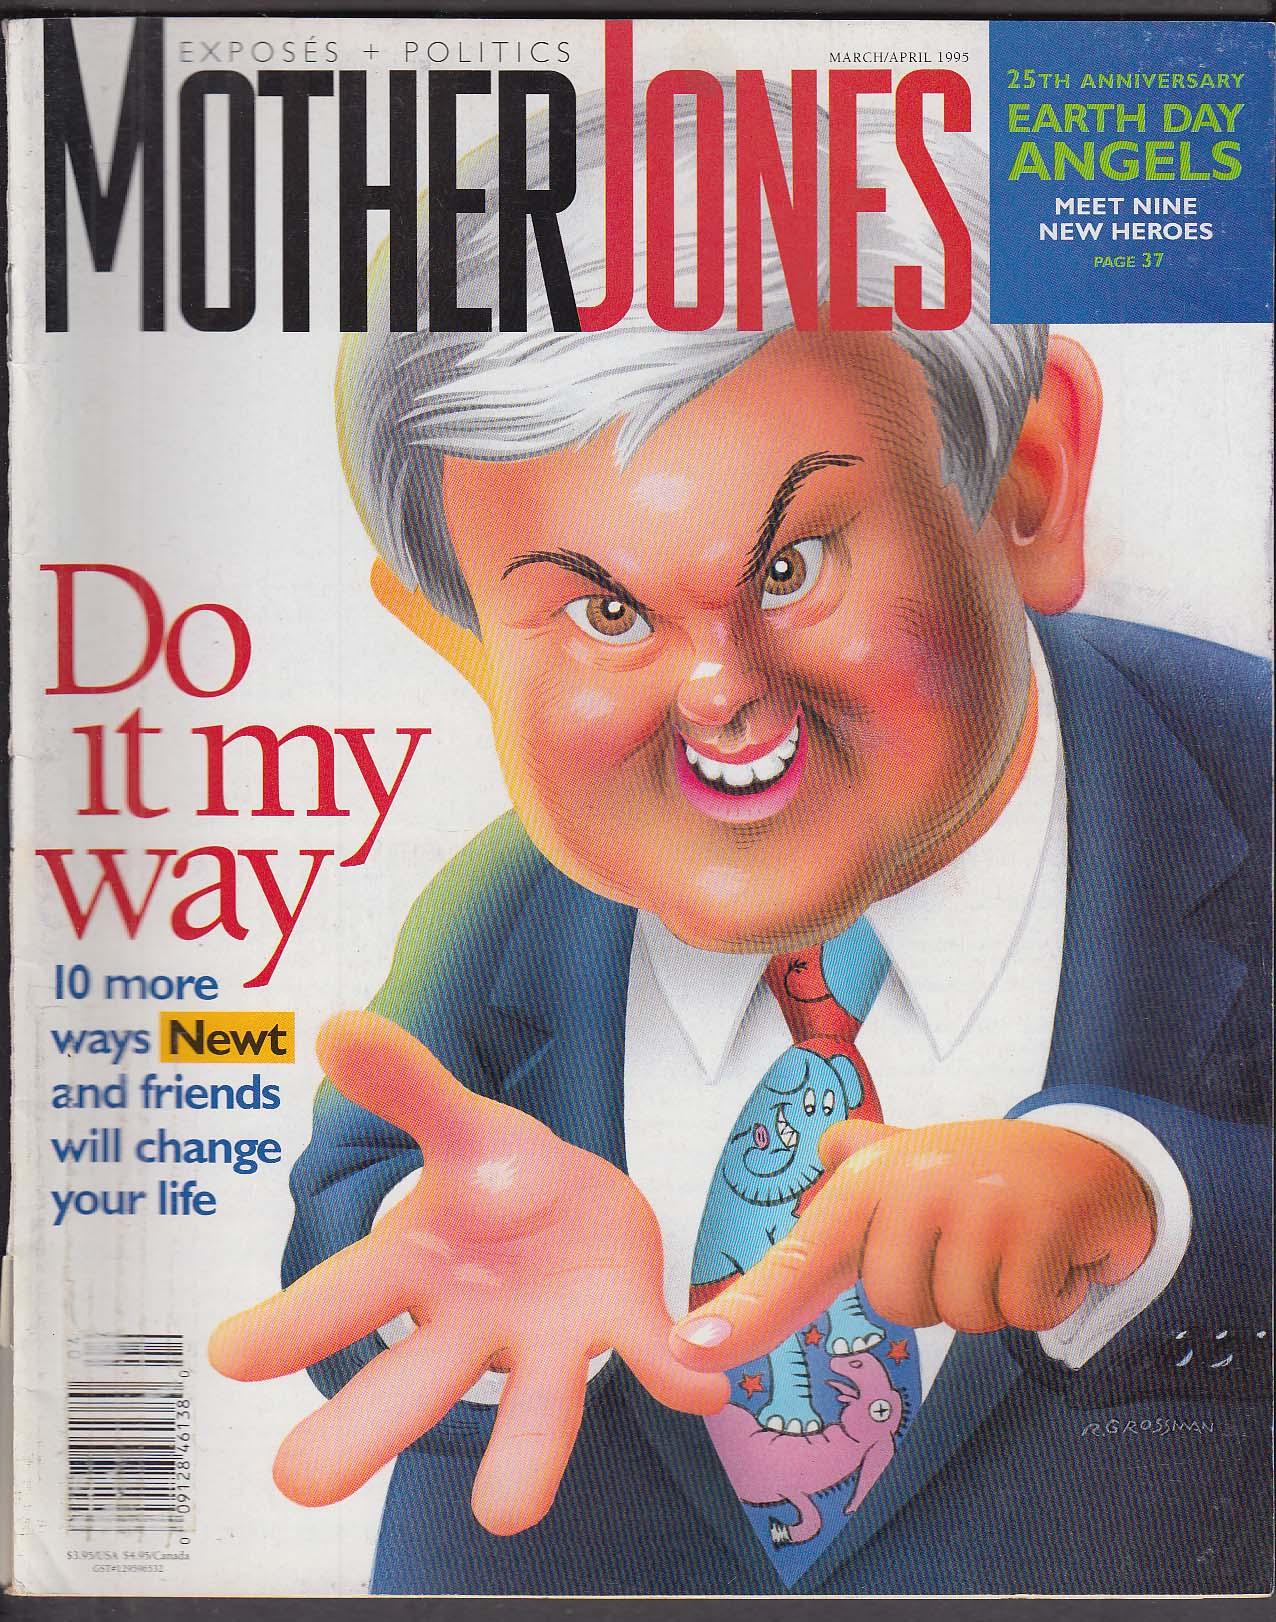 MOTHER JONES Newt Gingrich NRA Abortion Ntozake Shange Paula Poundstone 3-4 1995